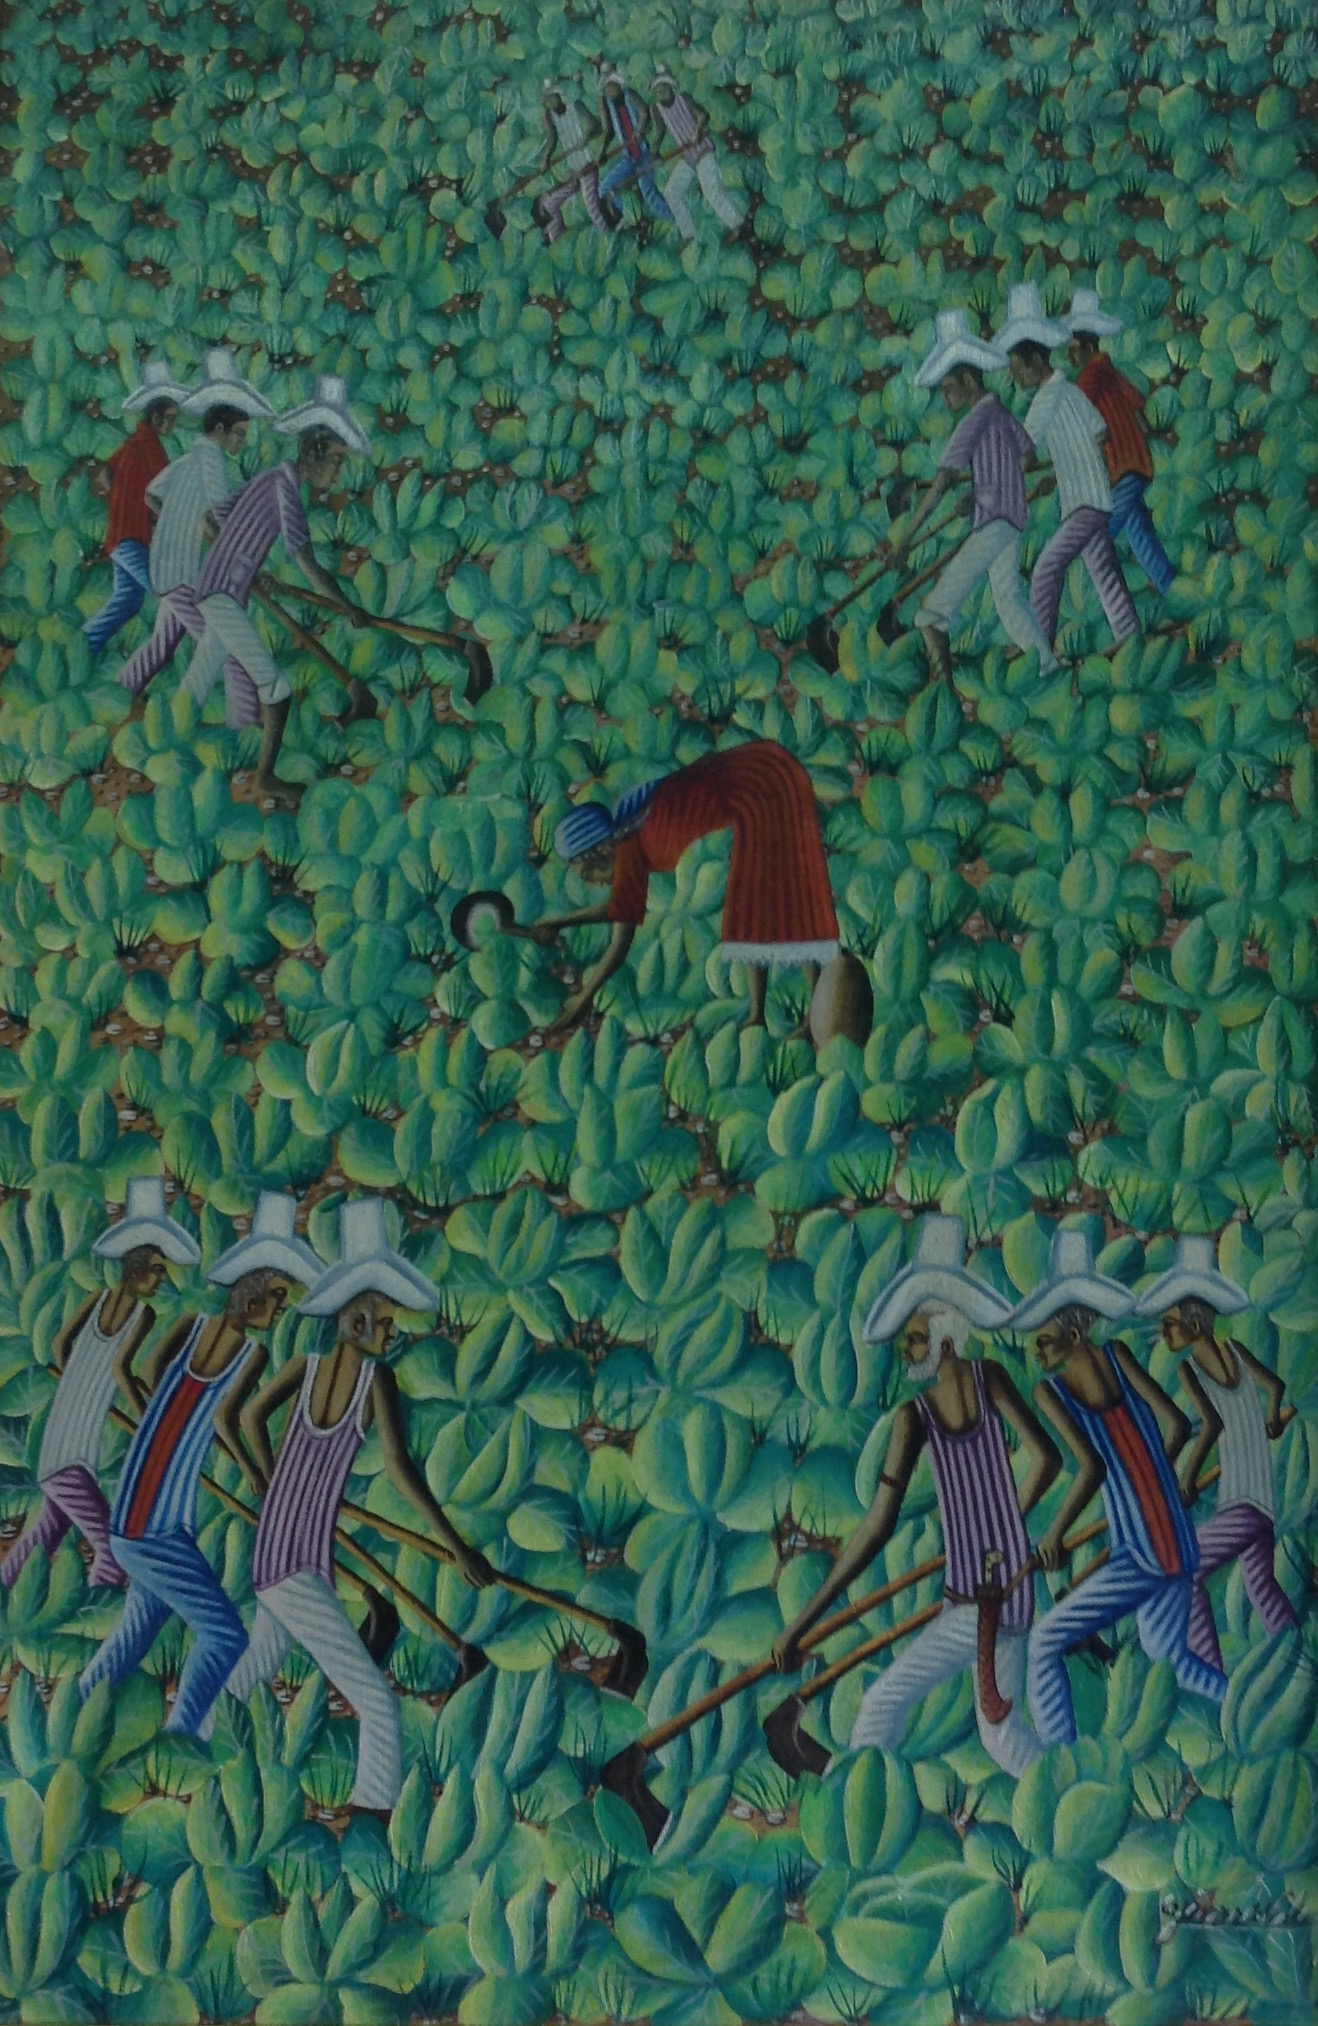 Valcin Gerard 36X24 #4-3-96 canvas 1980